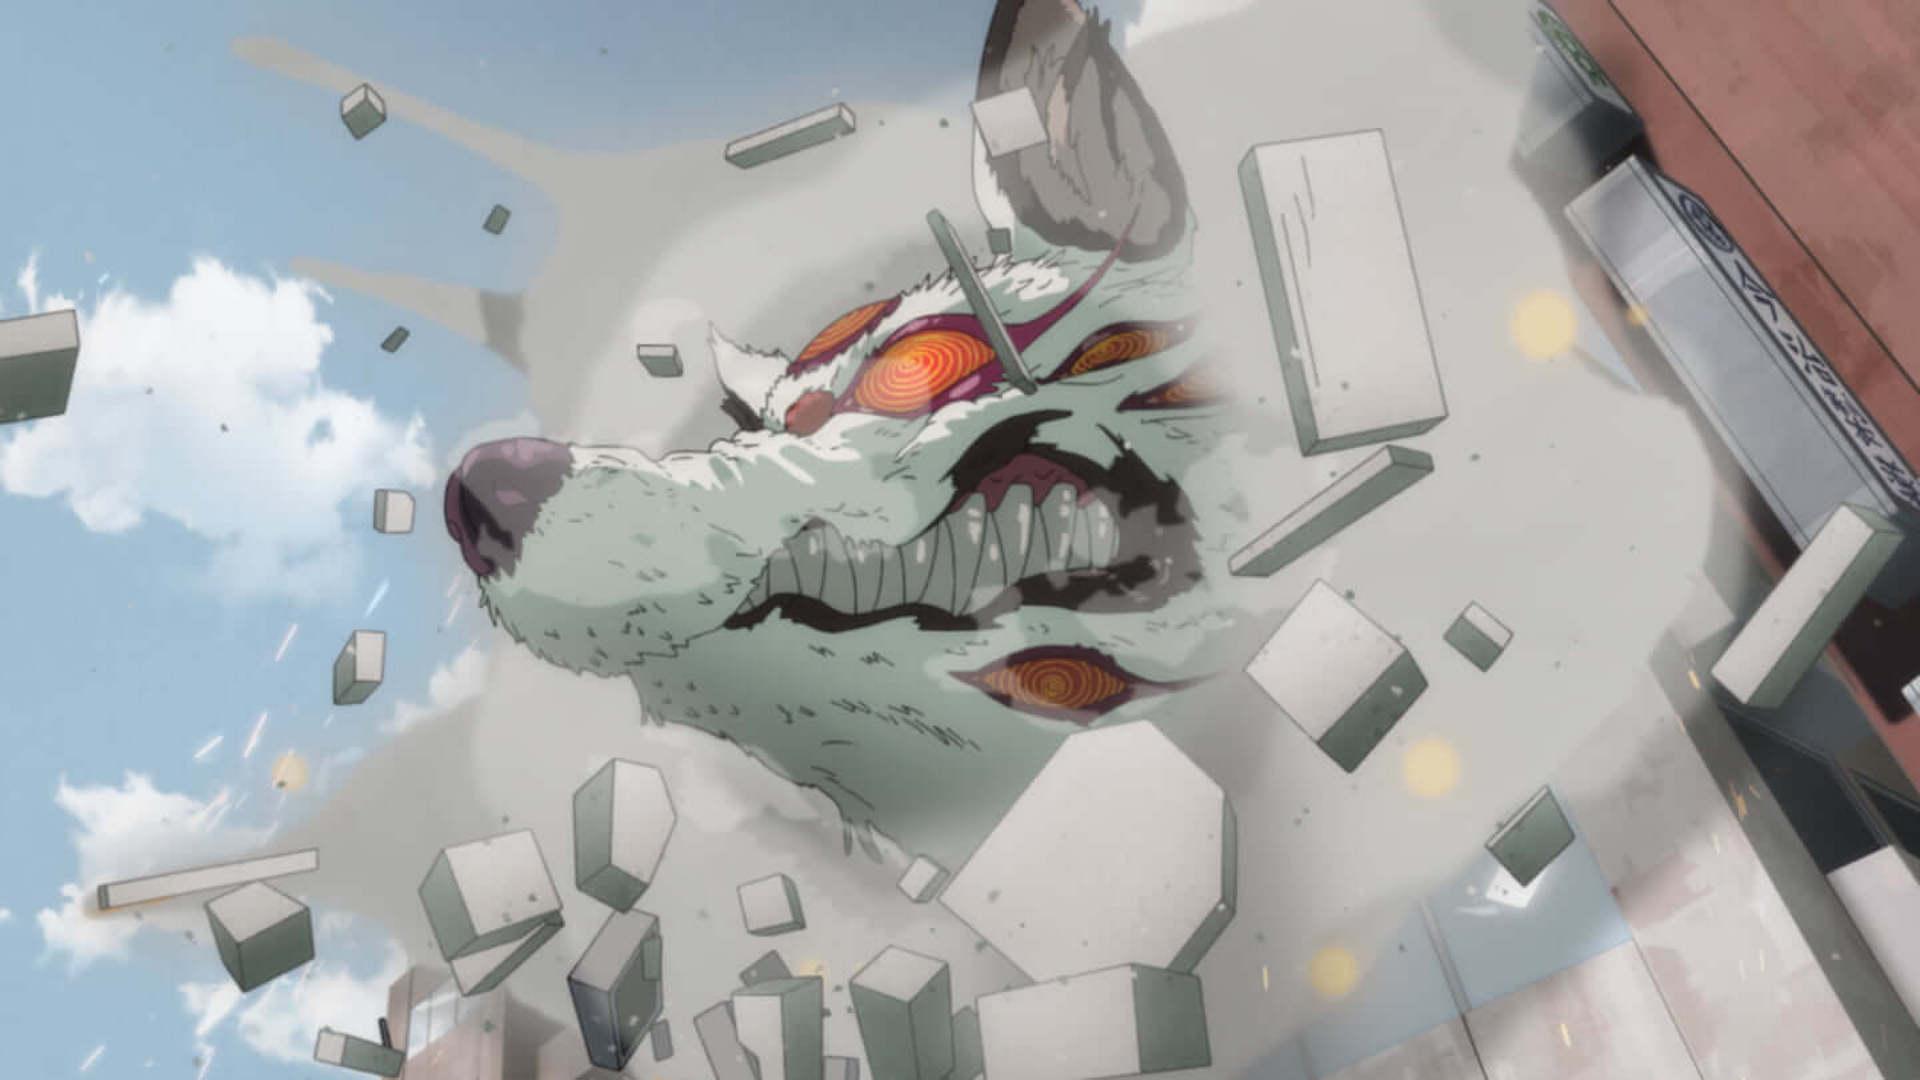 MAPPA制作のTVアニメ『チェンソーマン』ティザーPV&メインスタッフが解禁。音楽は牛尾憲輔